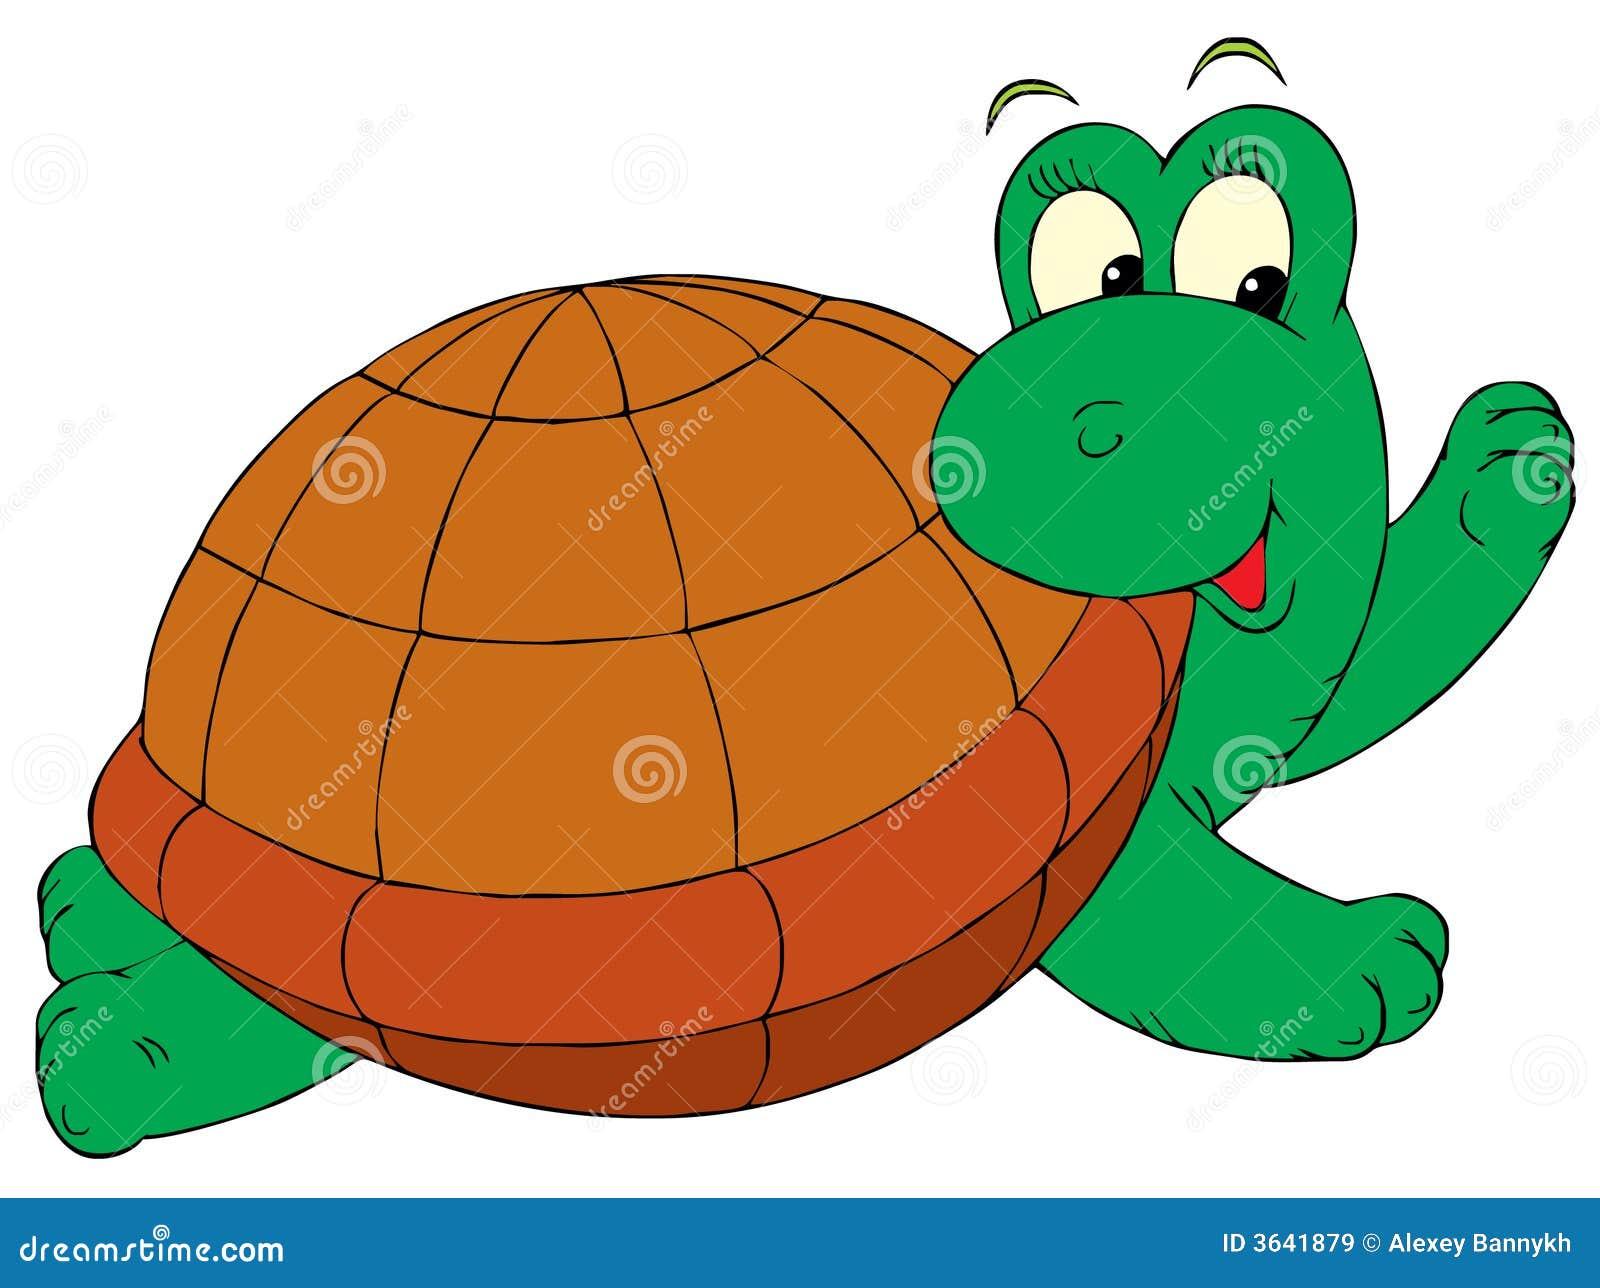 Tortue clip art de vecteur illustration de vecteur illustration du album clip 3641879 - Clipart tortue ...